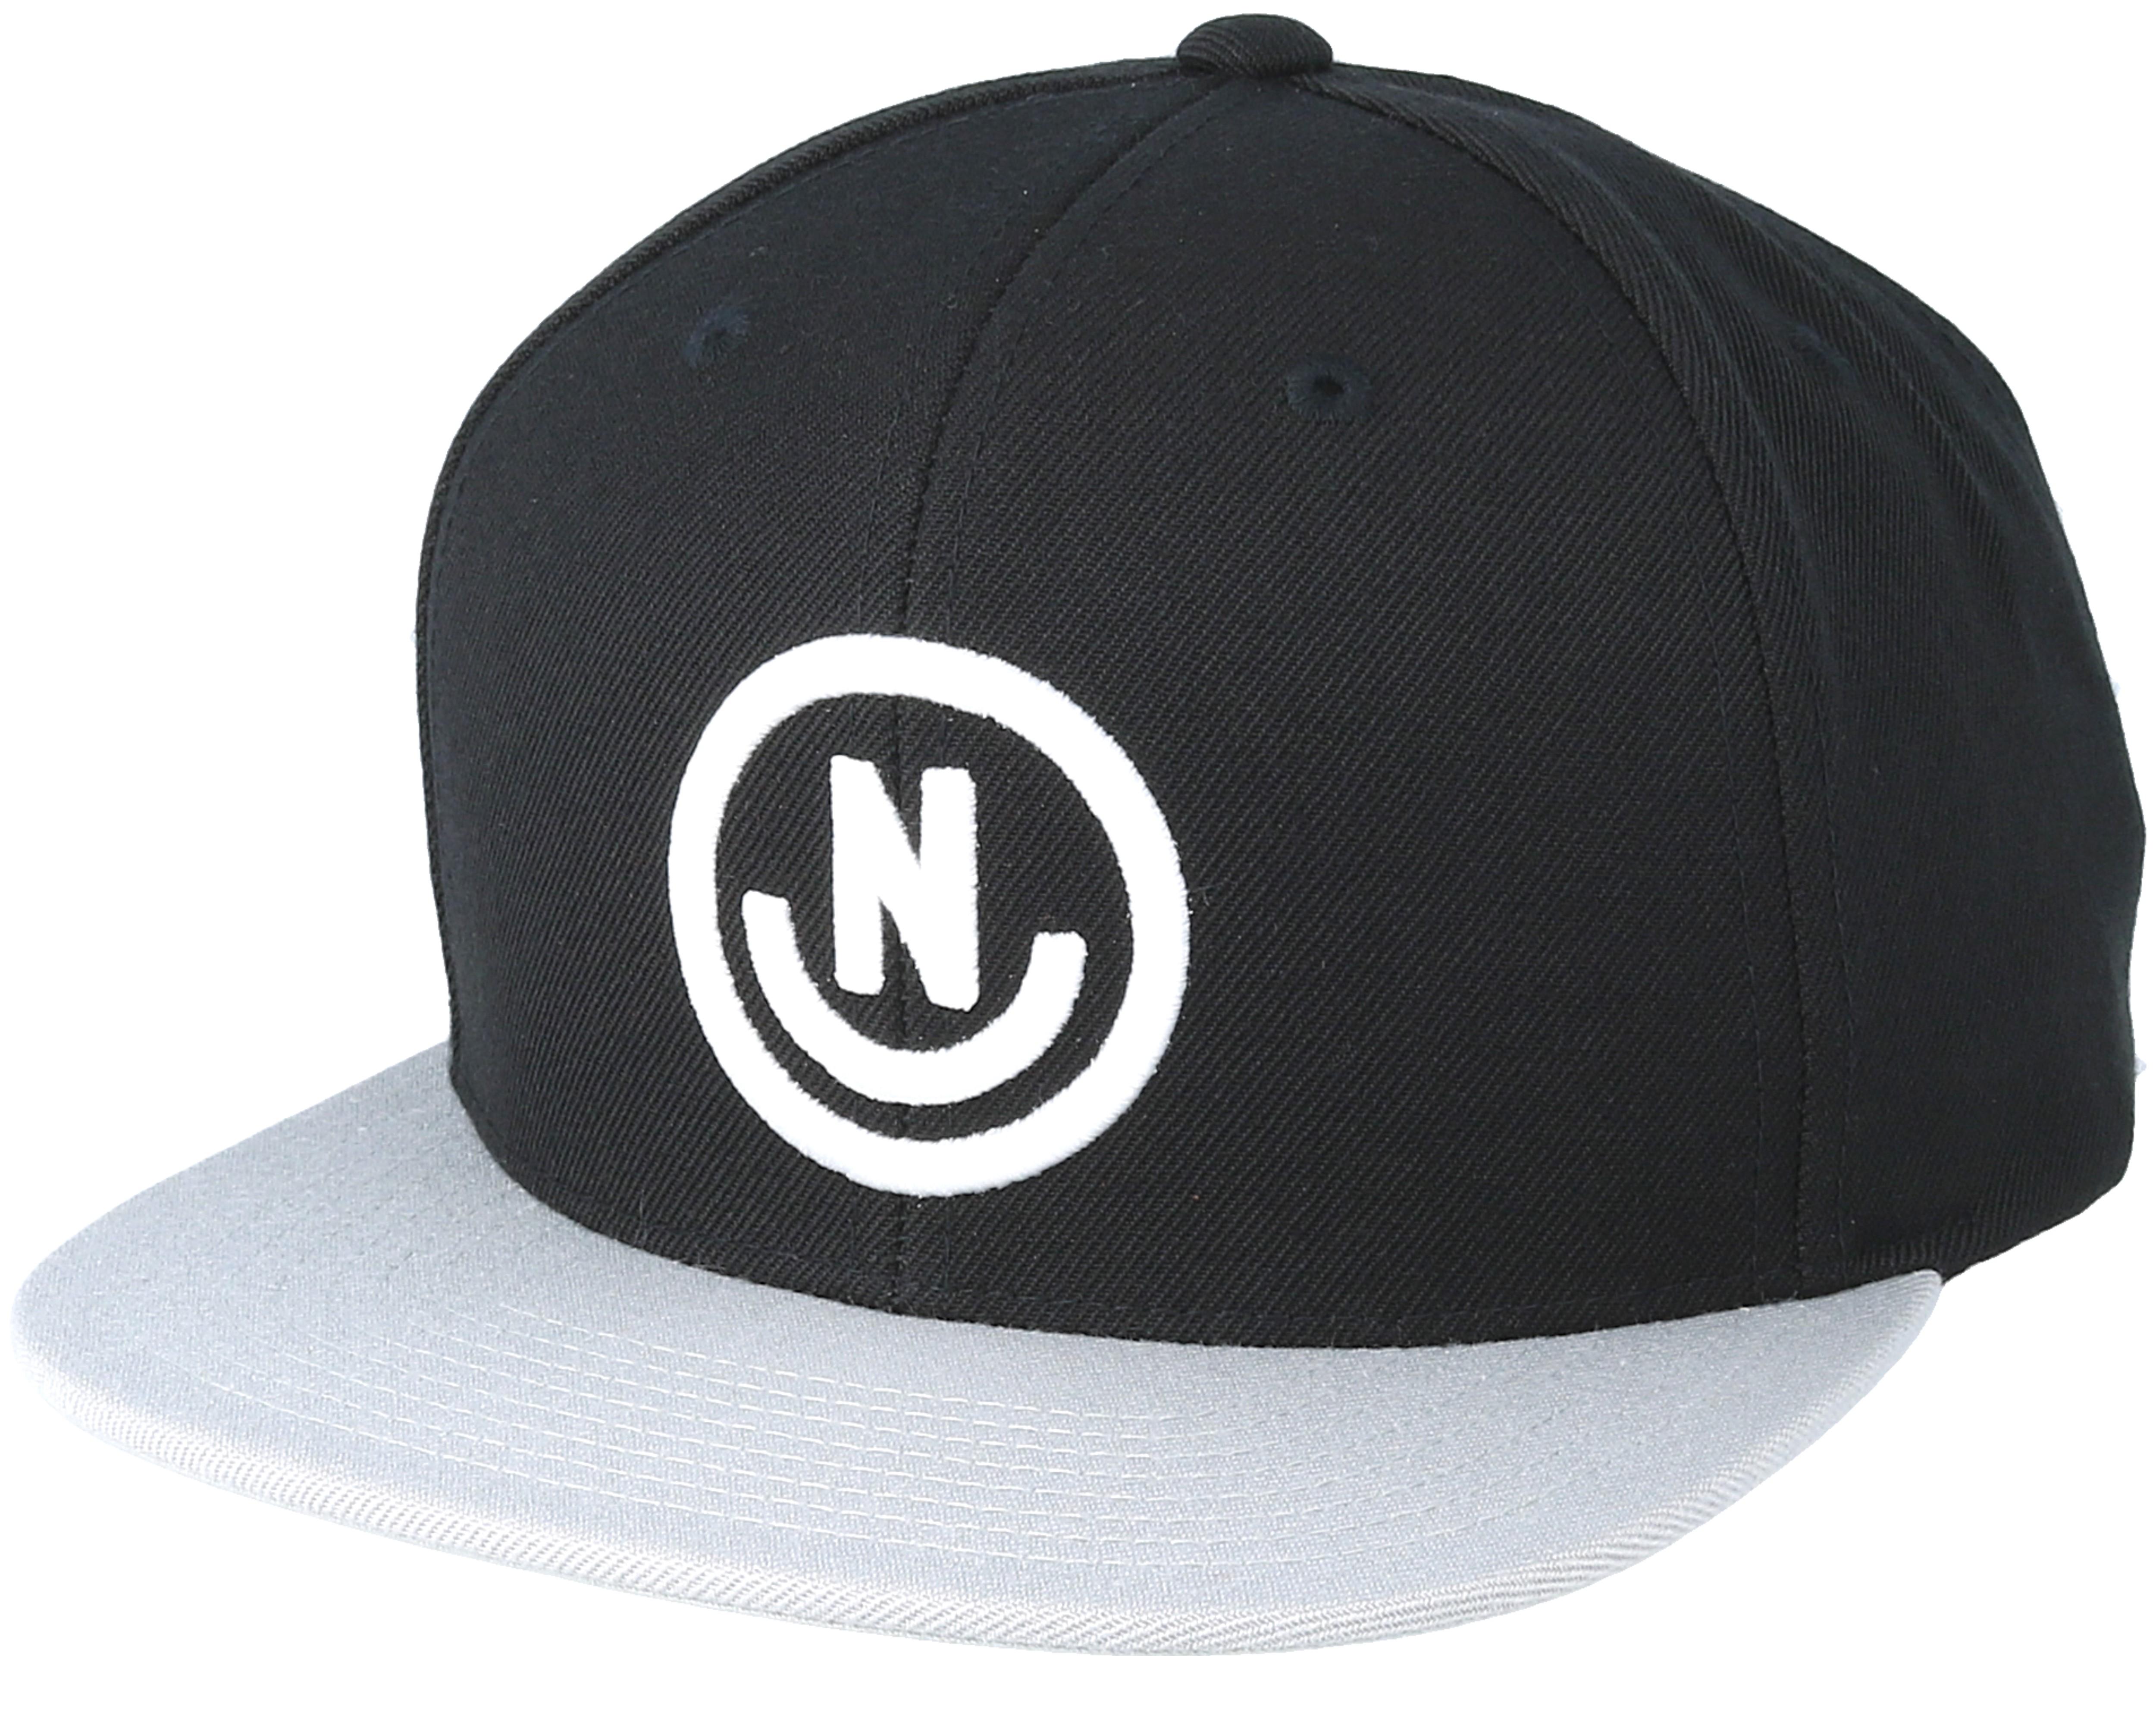 656f564bf0e Daily Smile Black Grey Snapback - Neff caps